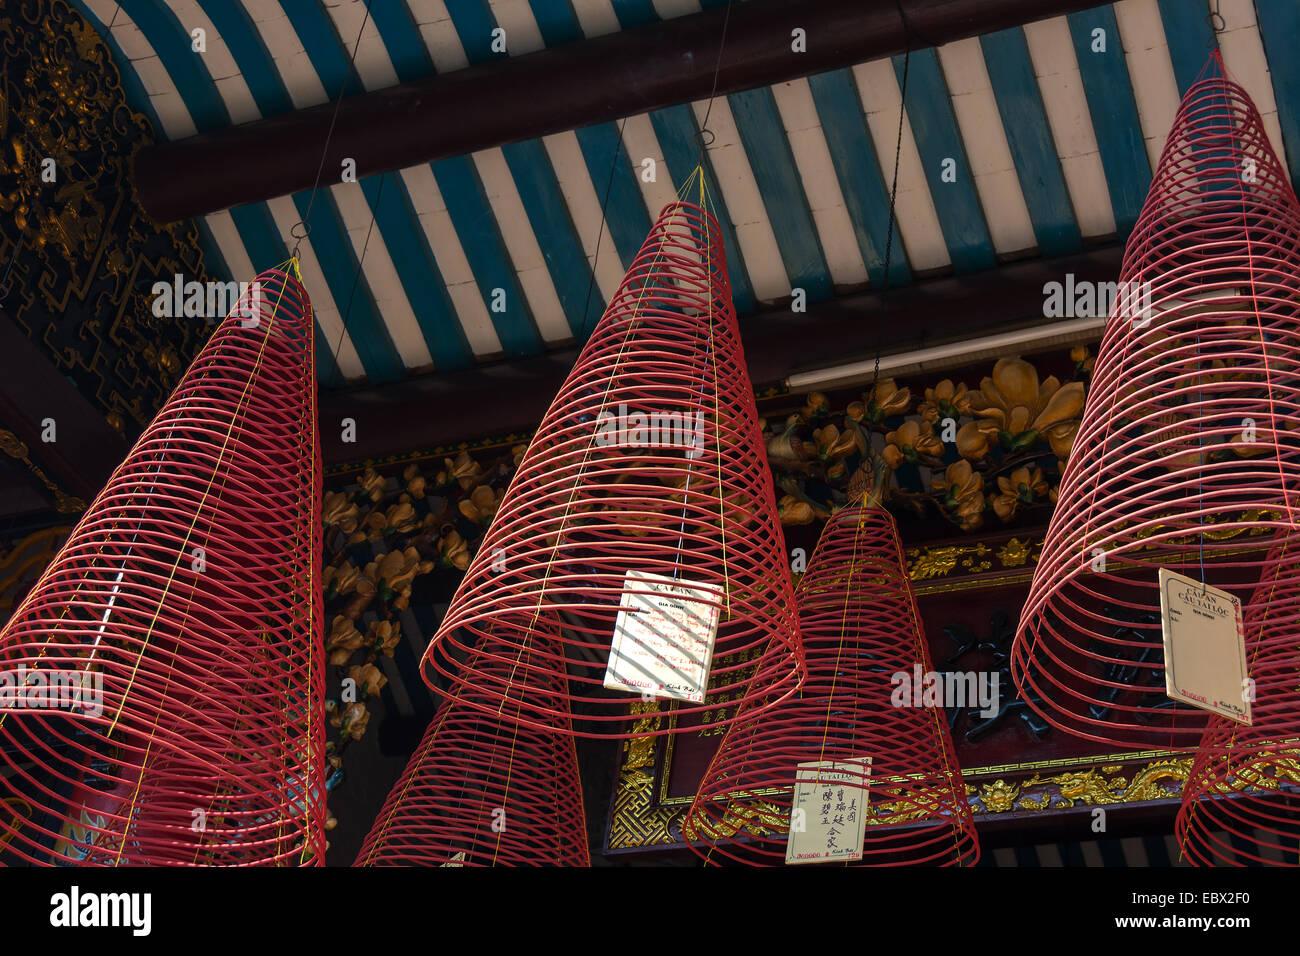 Incense coil burning at Hokien (Fujian) Meeting Hall, Phuc Kien in Hoi An Vietnam - Stock Image